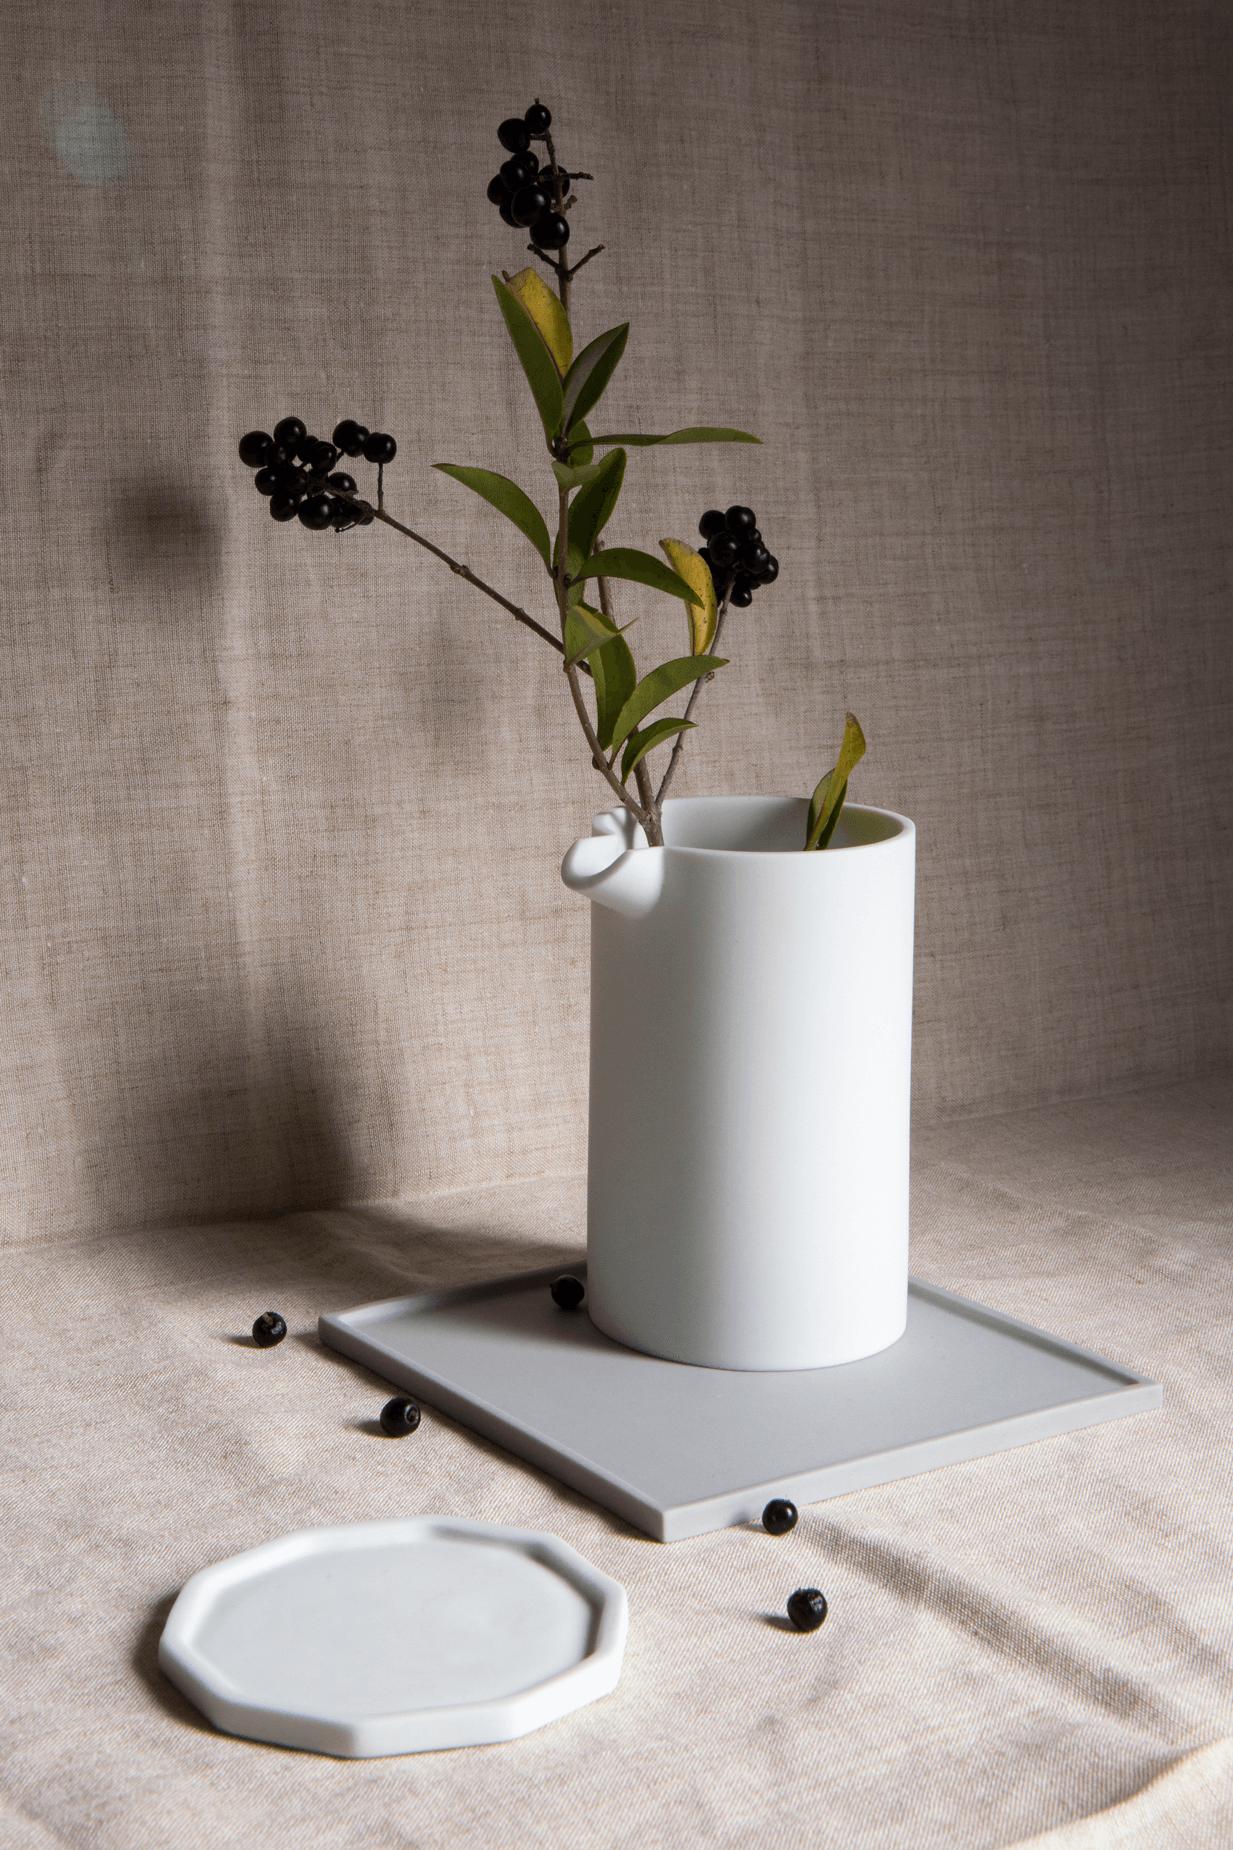 Natalie J Wood - Detsu parian clay pourer and plate